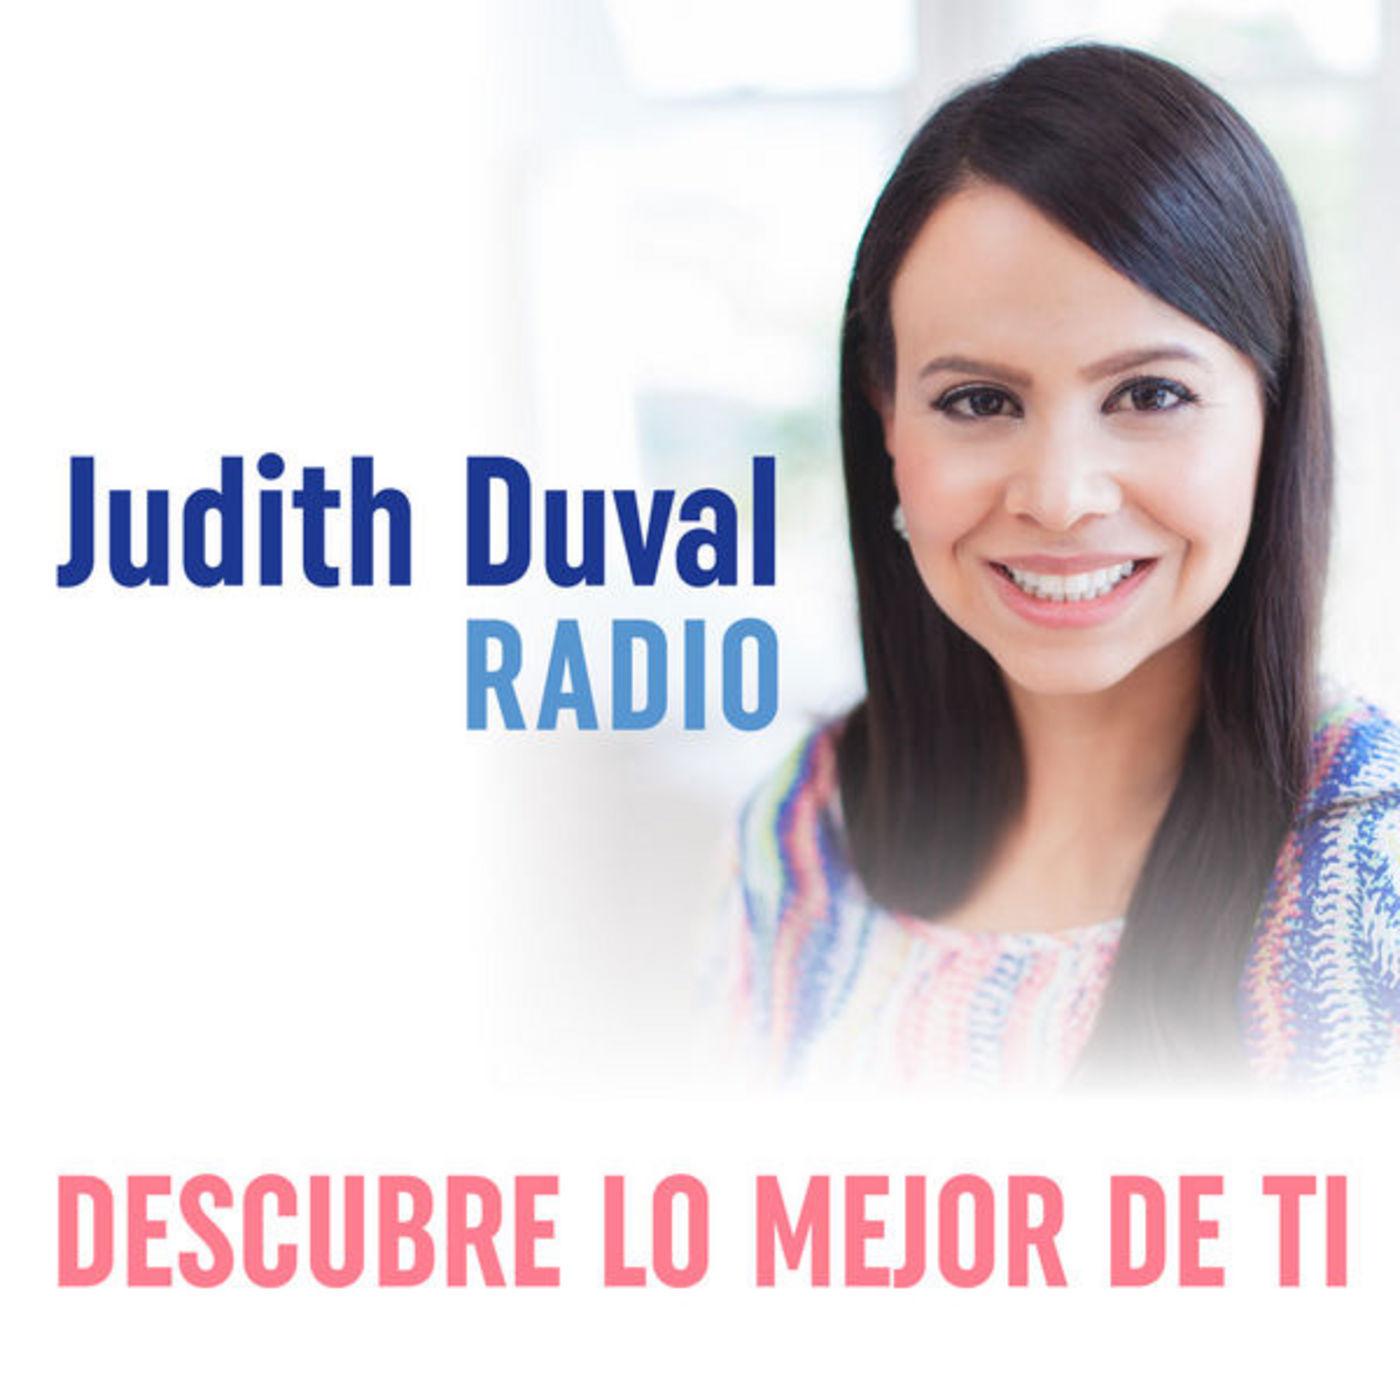 <![CDATA[Judith Duval: Descubre Lo Mejor De Ti]]>